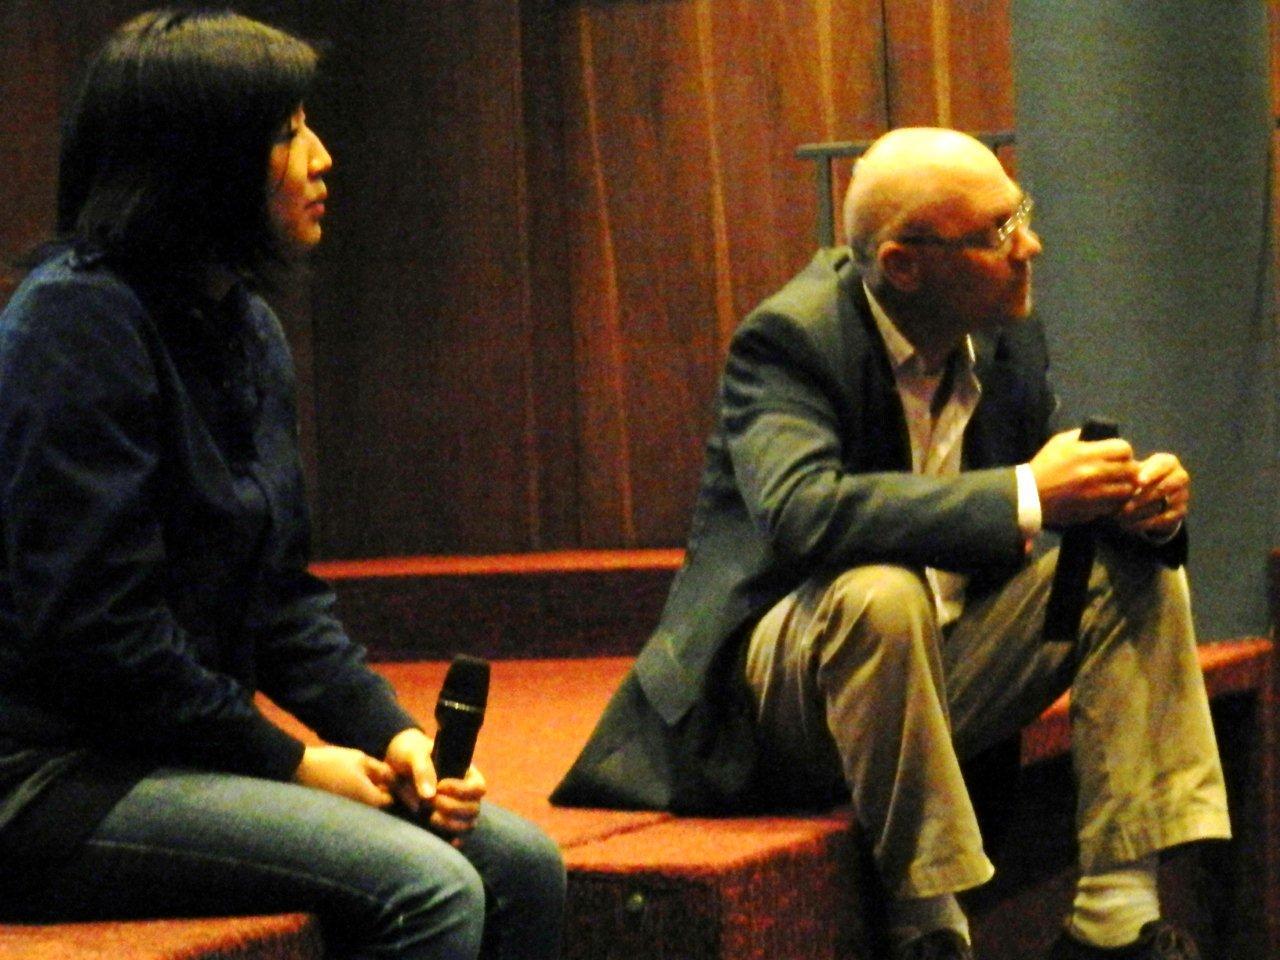 Uranium Film Festival - Fukushima Filmmaker Yoko Kumano and festival director